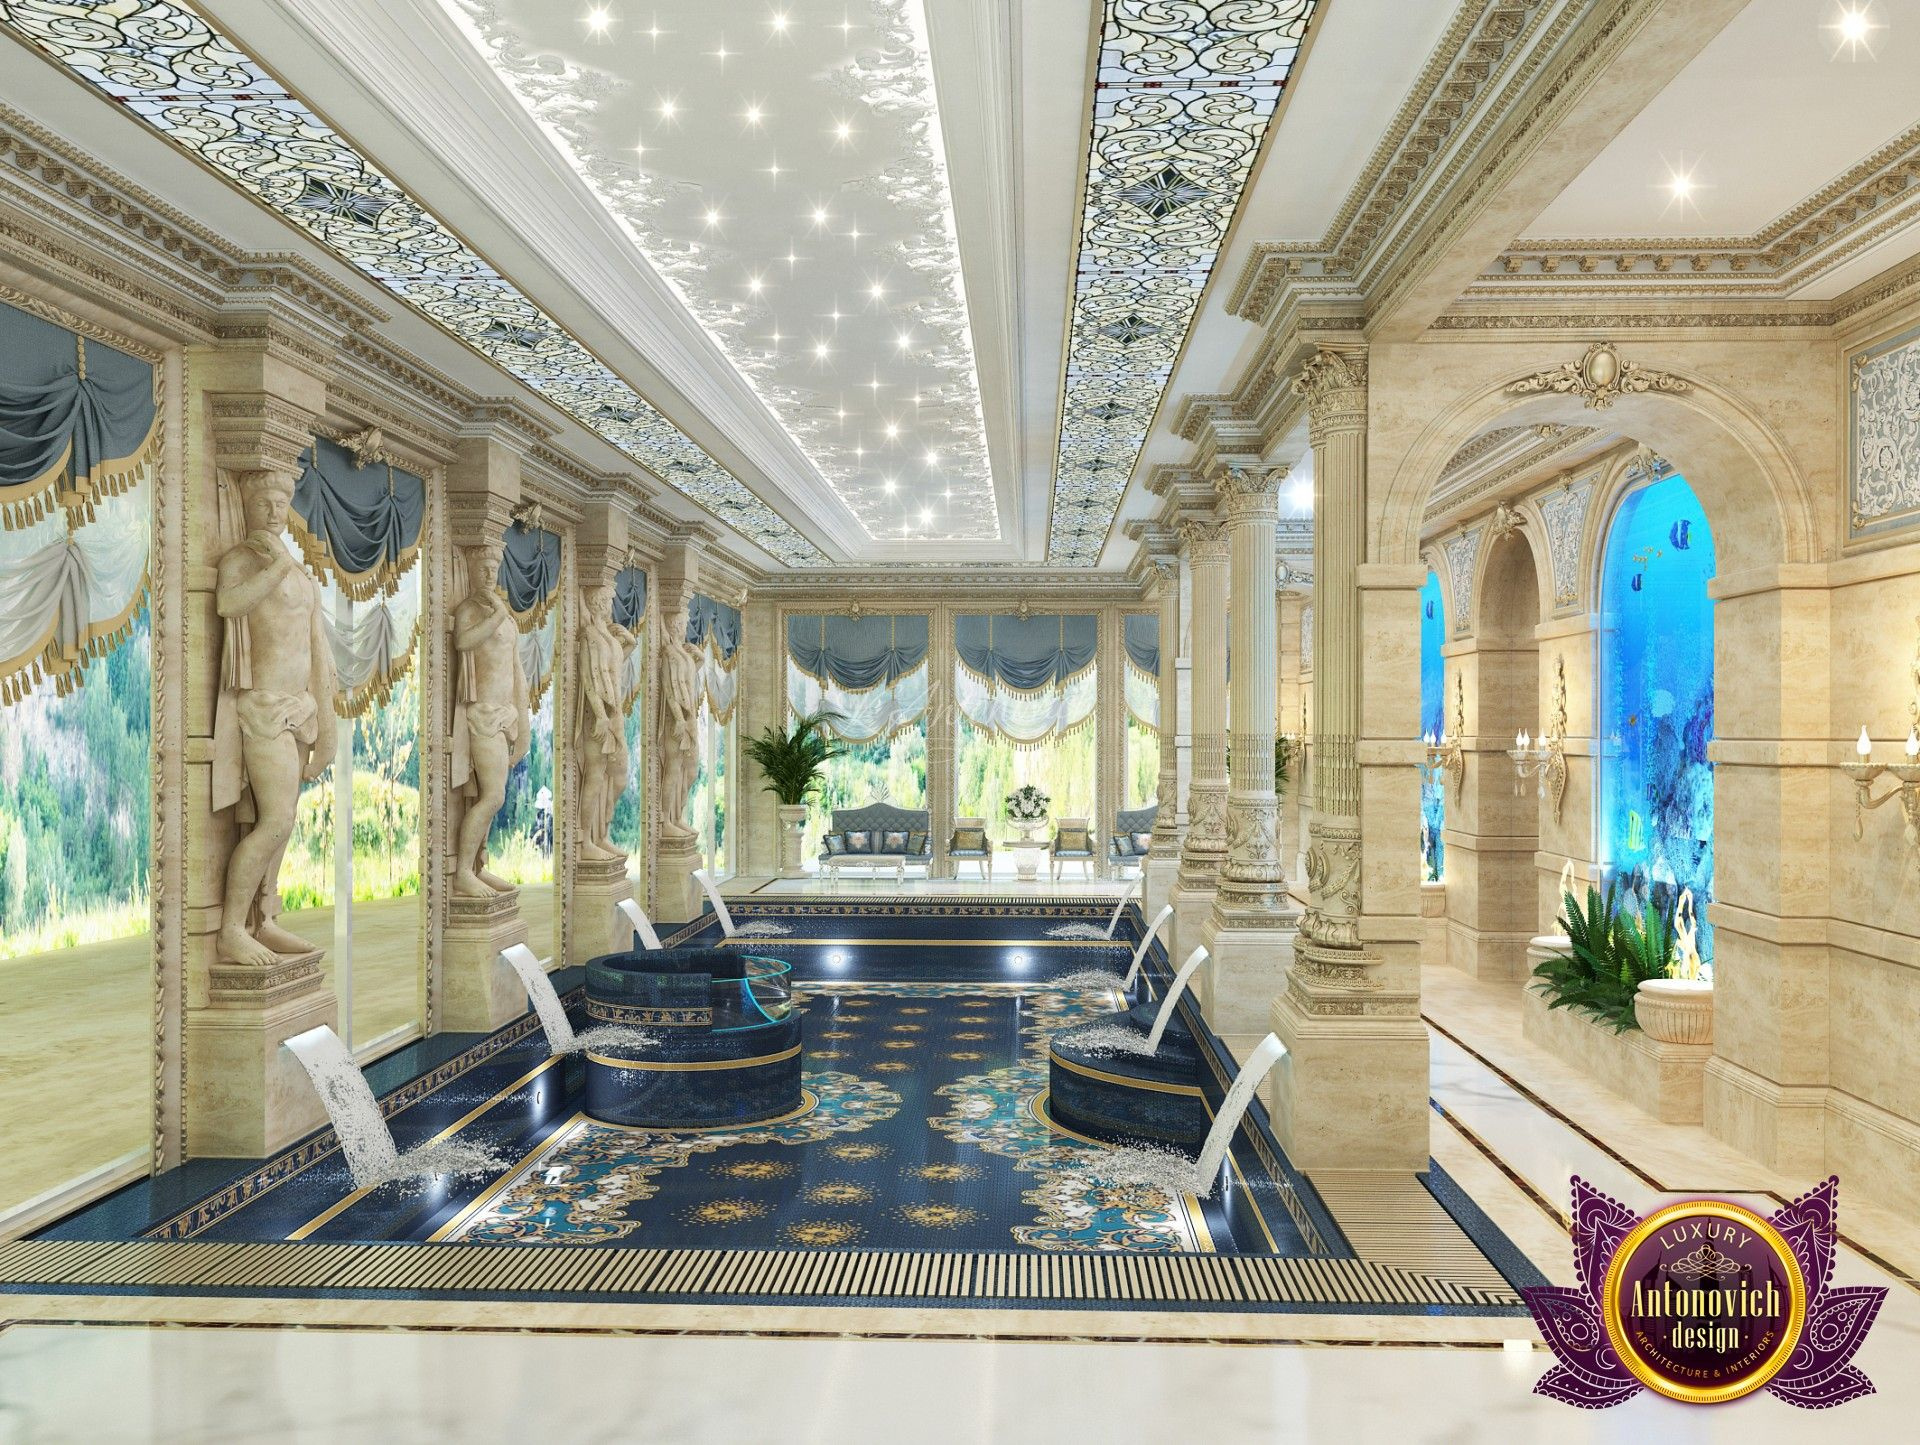 Luxurious Villa Design In Cambodia With Images Villa Design